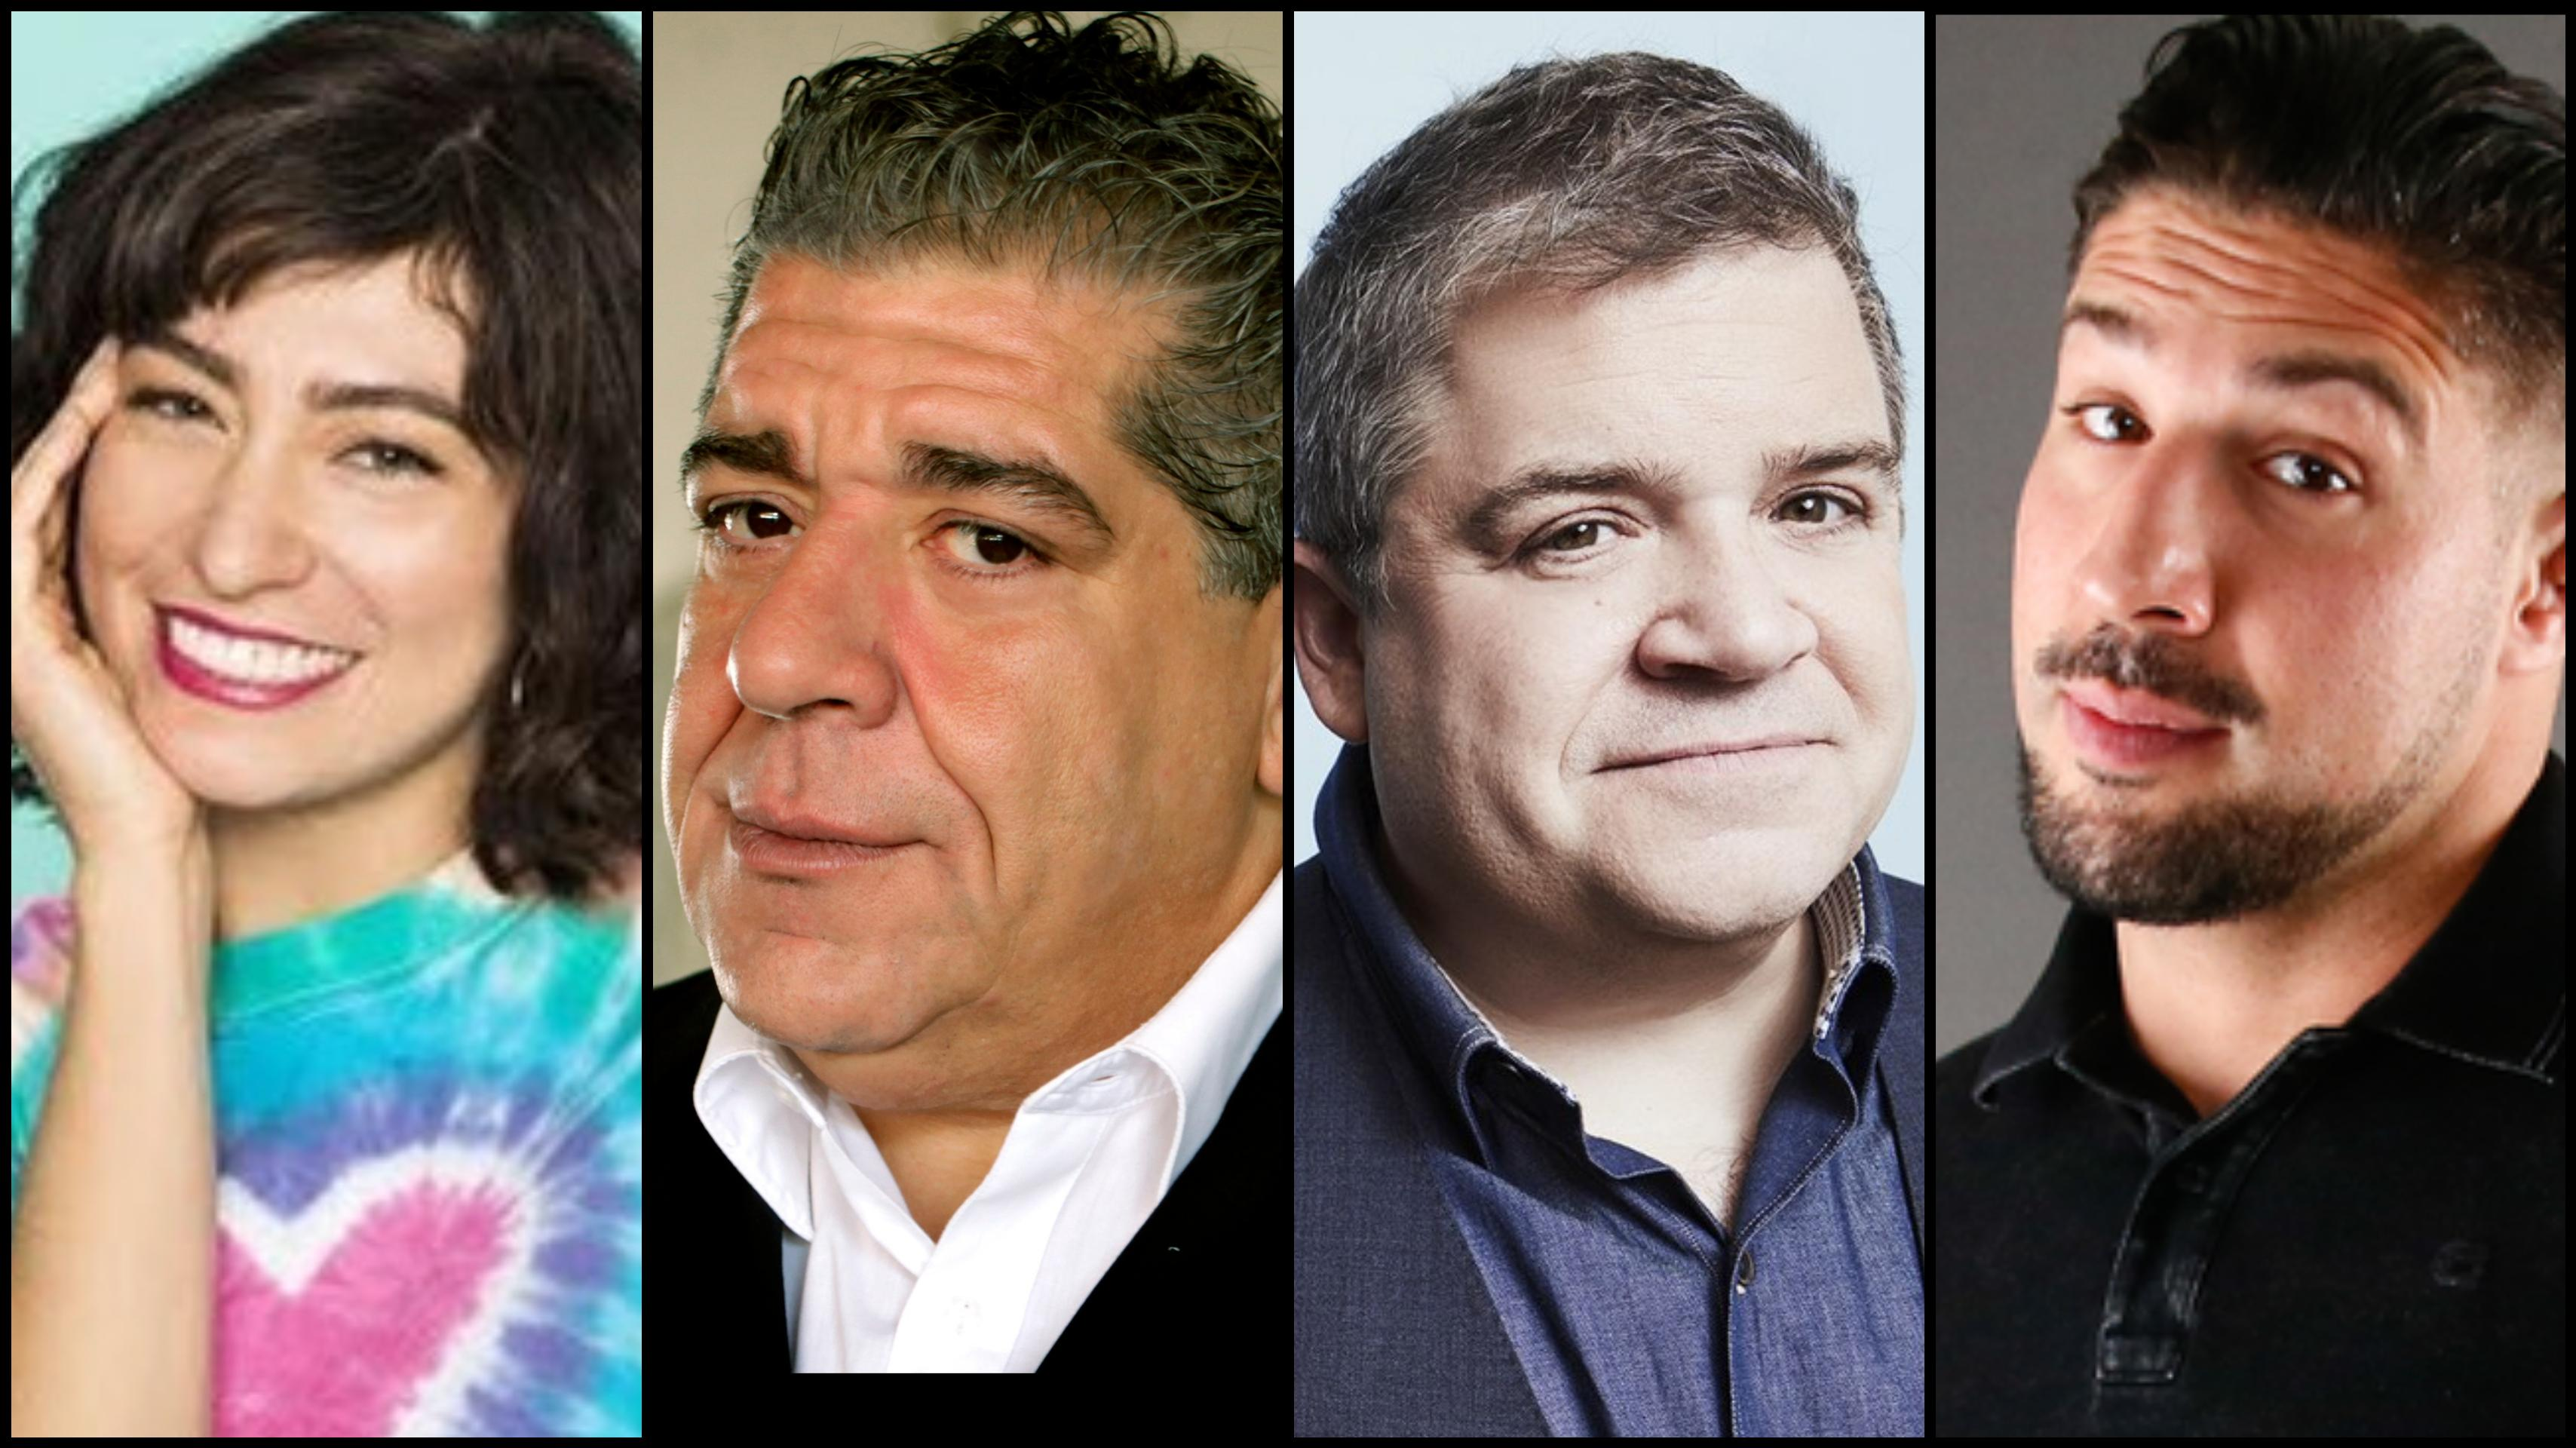 Mello Comedic Joey Diaz, Patton Oswalt, Melissa Villasenor, Brendan Schaub